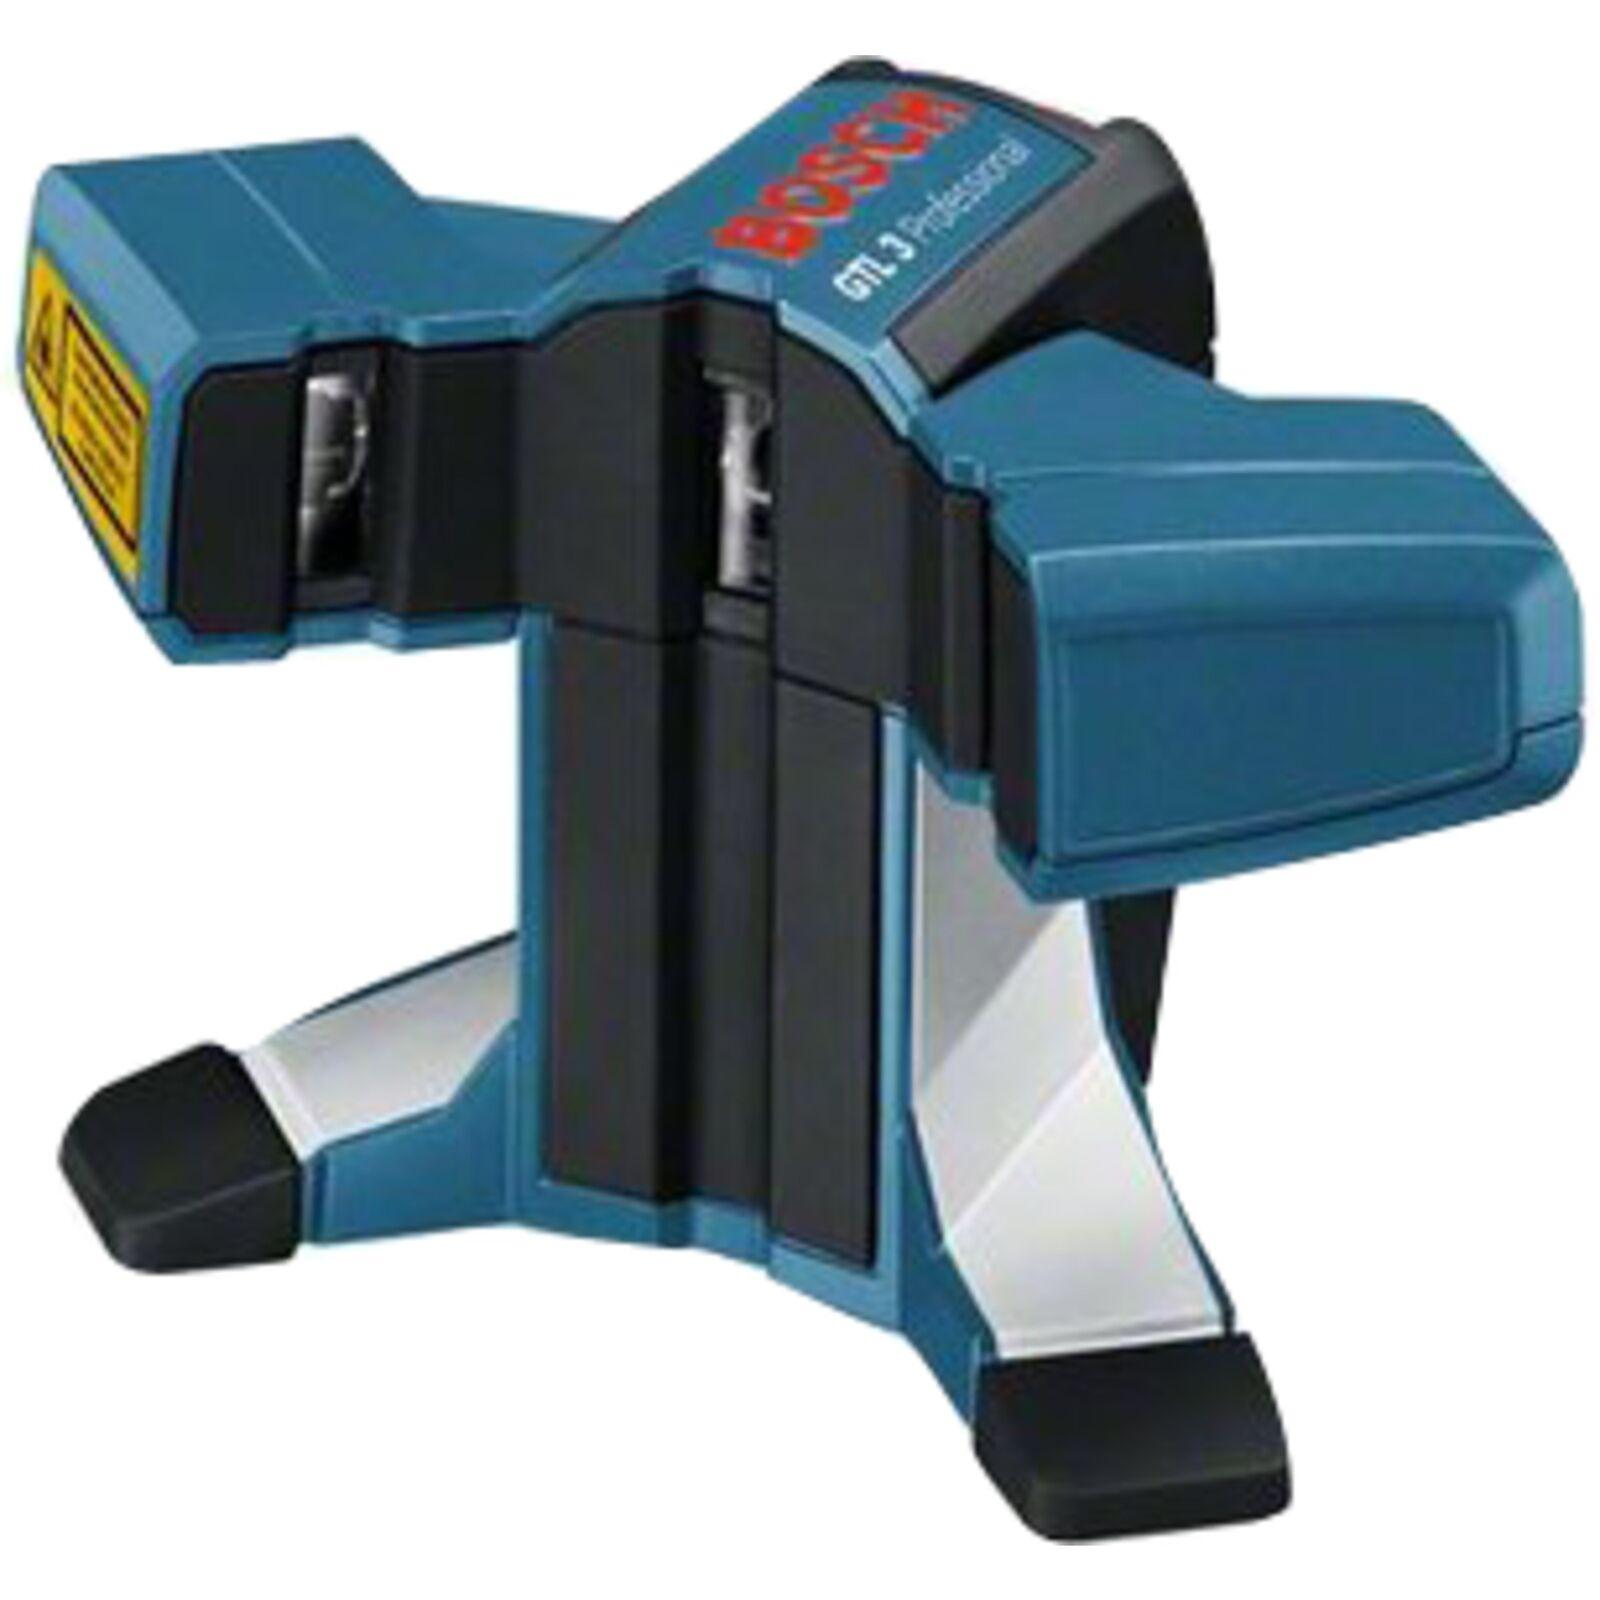 Bosch Professional Fliesenlaser GTL 3 Professional, Linienlaser, blau